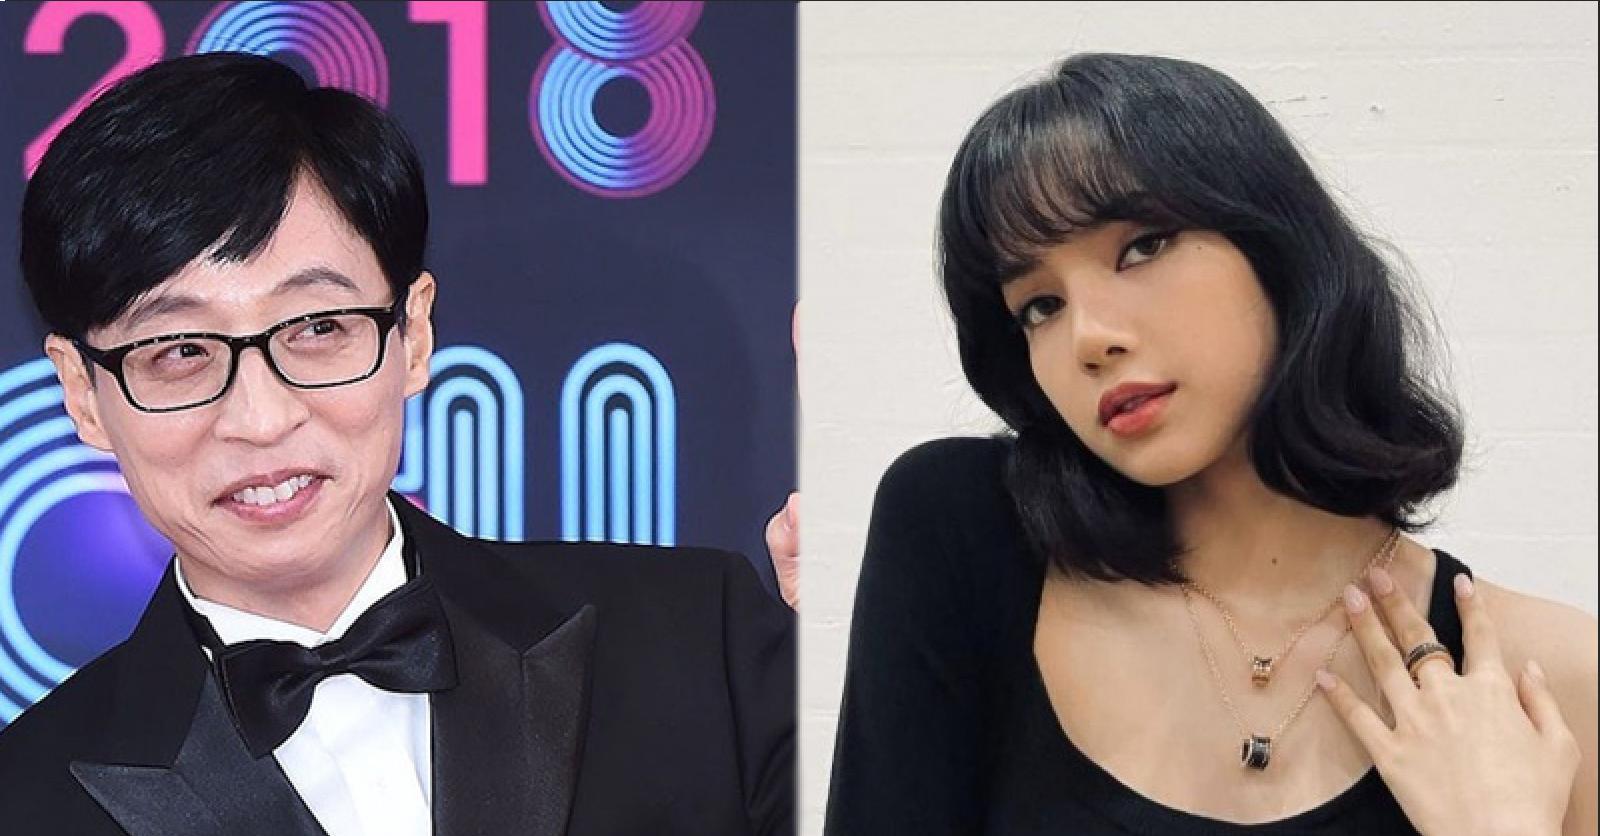 Yoo Jae Suk Reveals BLACKPINK Lisa Solo Debut Will be in July